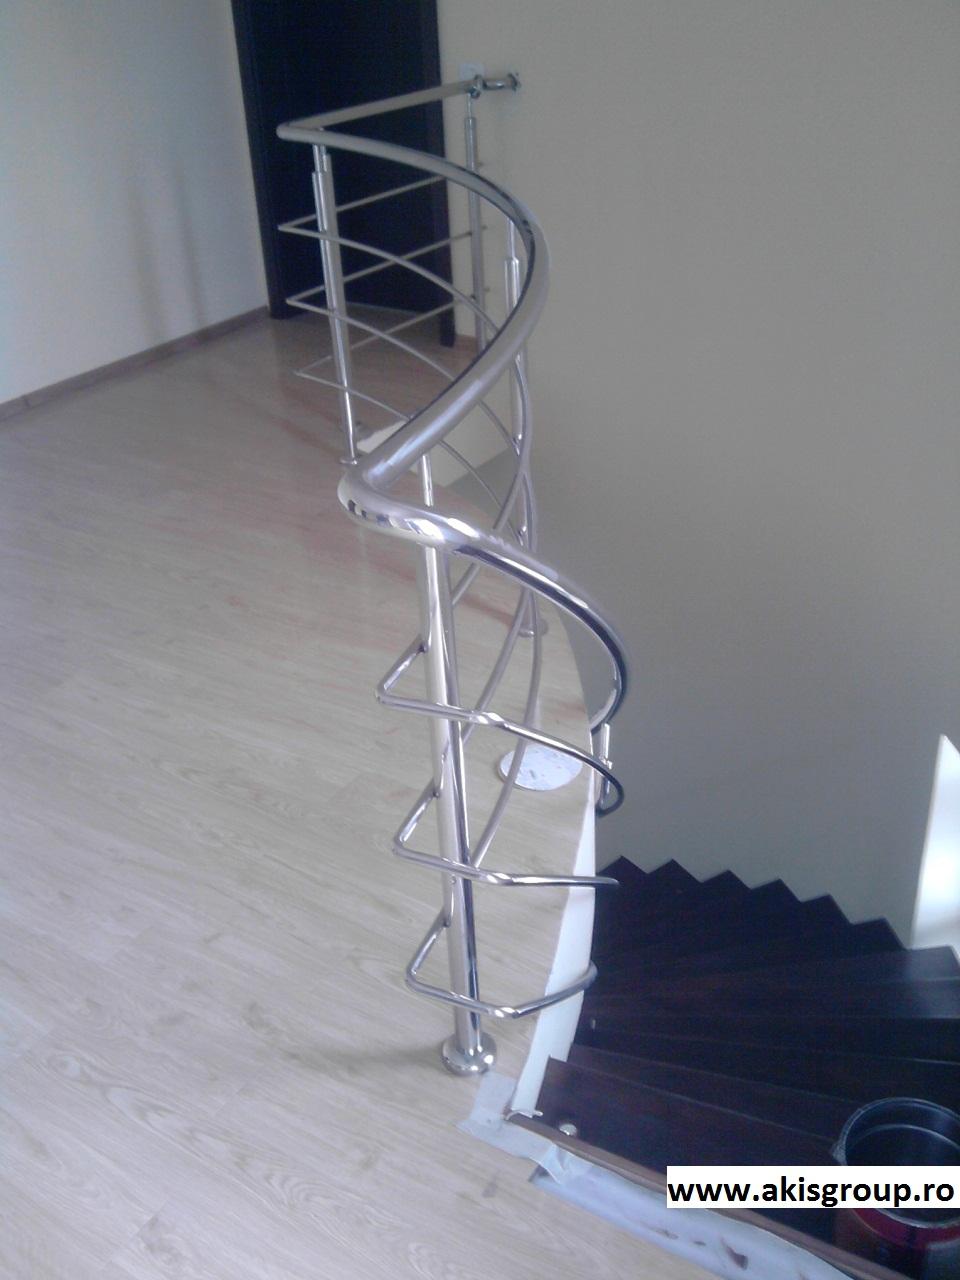 balustrade inox balustrade inox interior balustrade. Black Bedroom Furniture Sets. Home Design Ideas